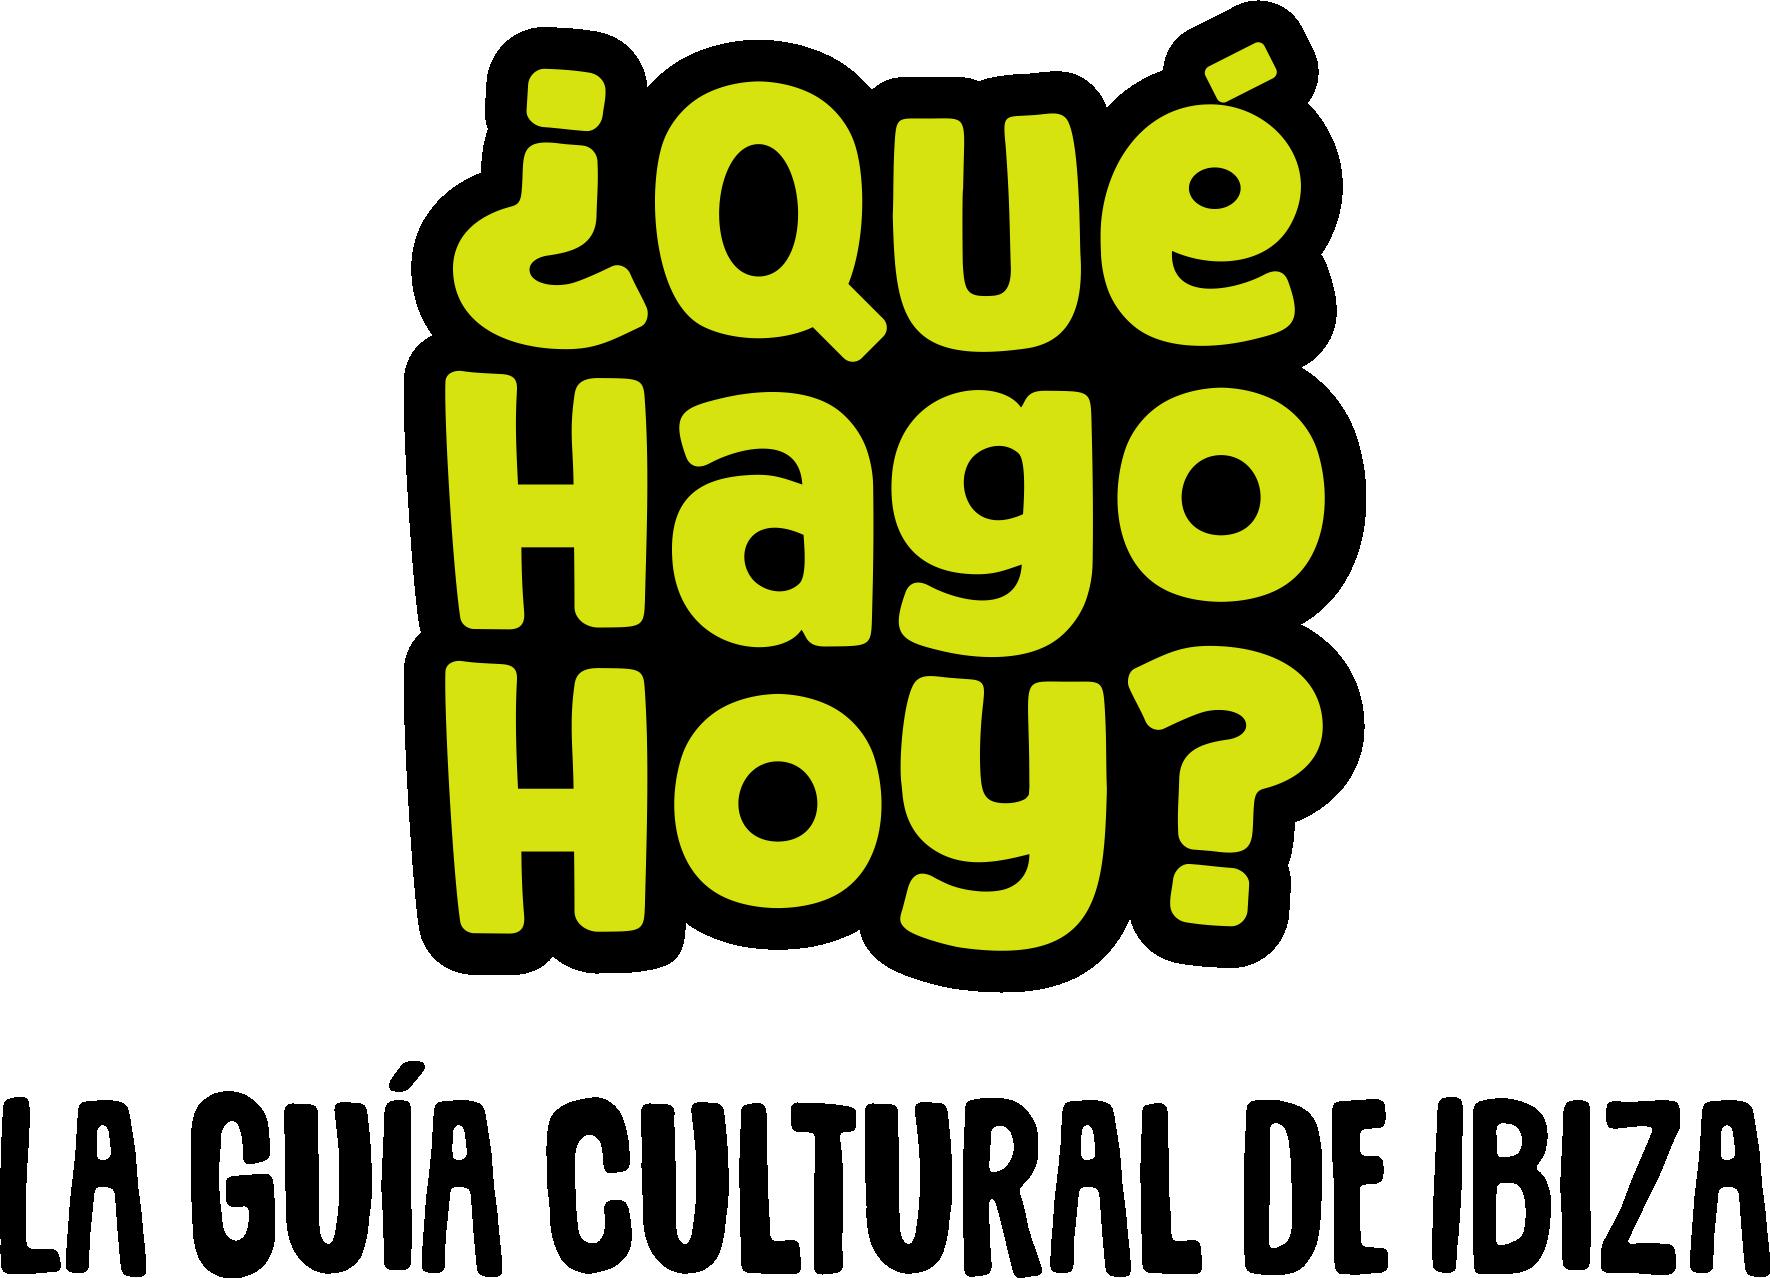 LOGO_POSITIVO_FRASE.png